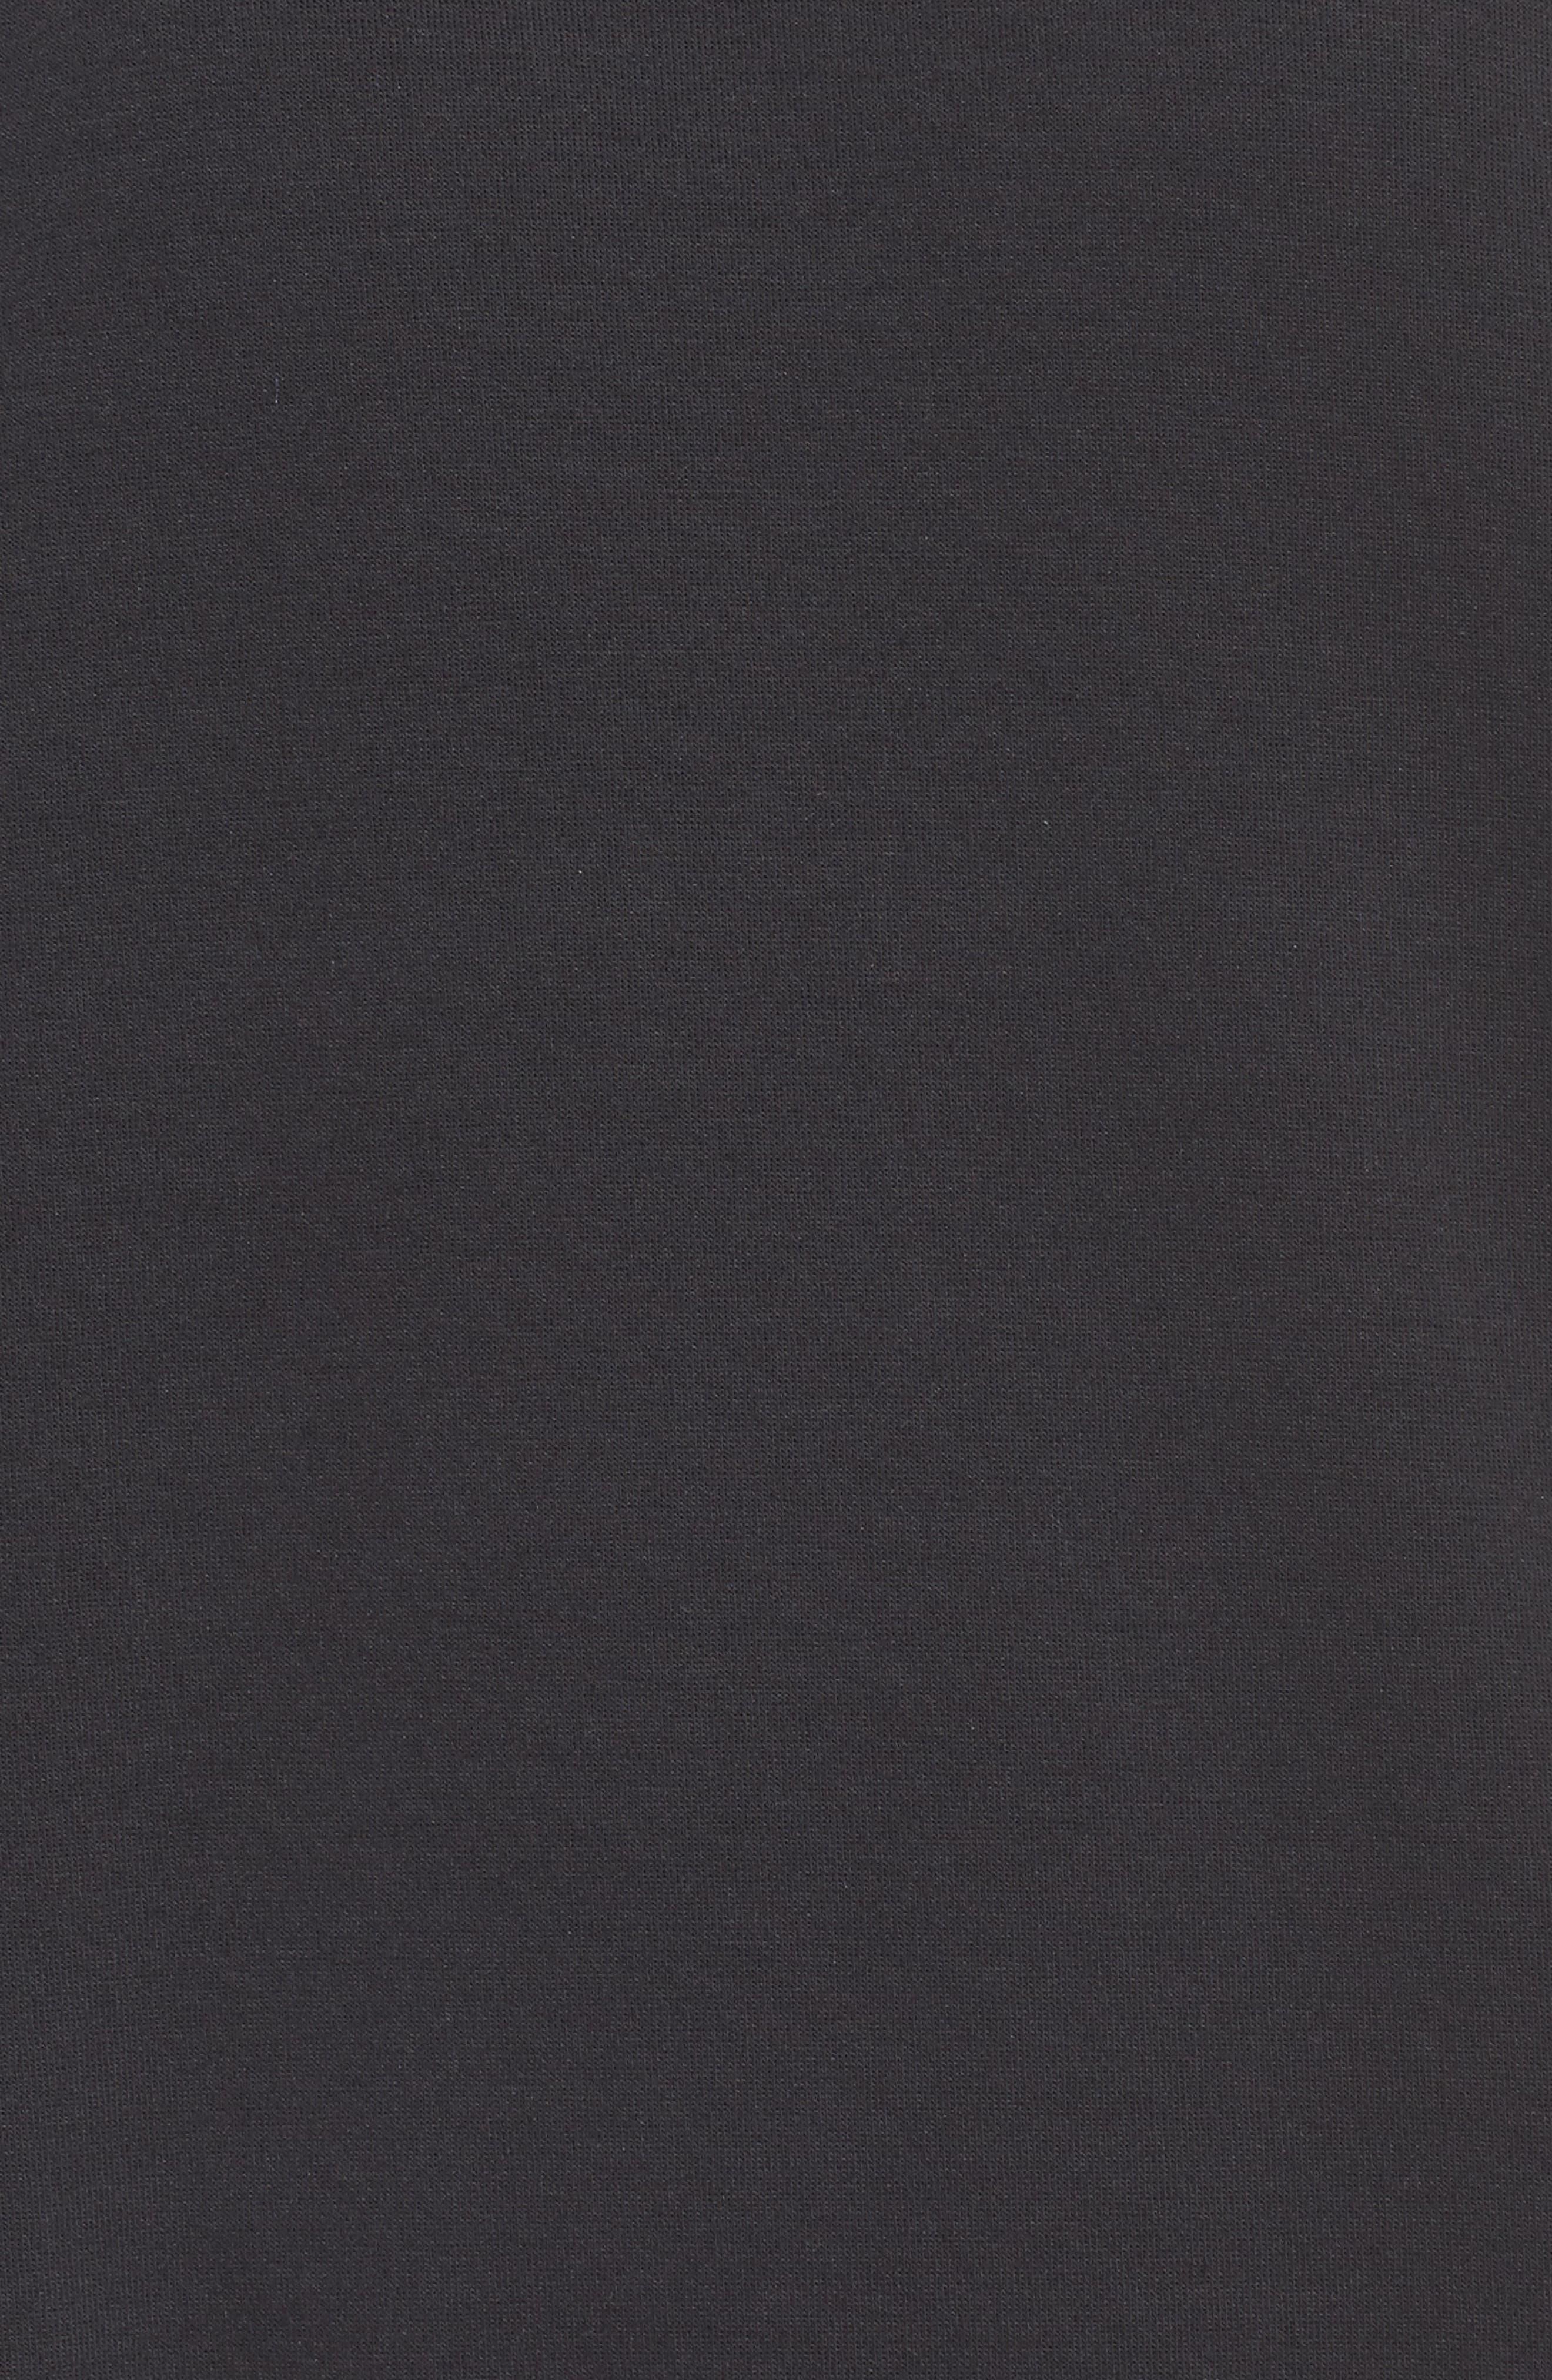 Oversized Sweatshirt,                             Alternate thumbnail 6, color,                             005